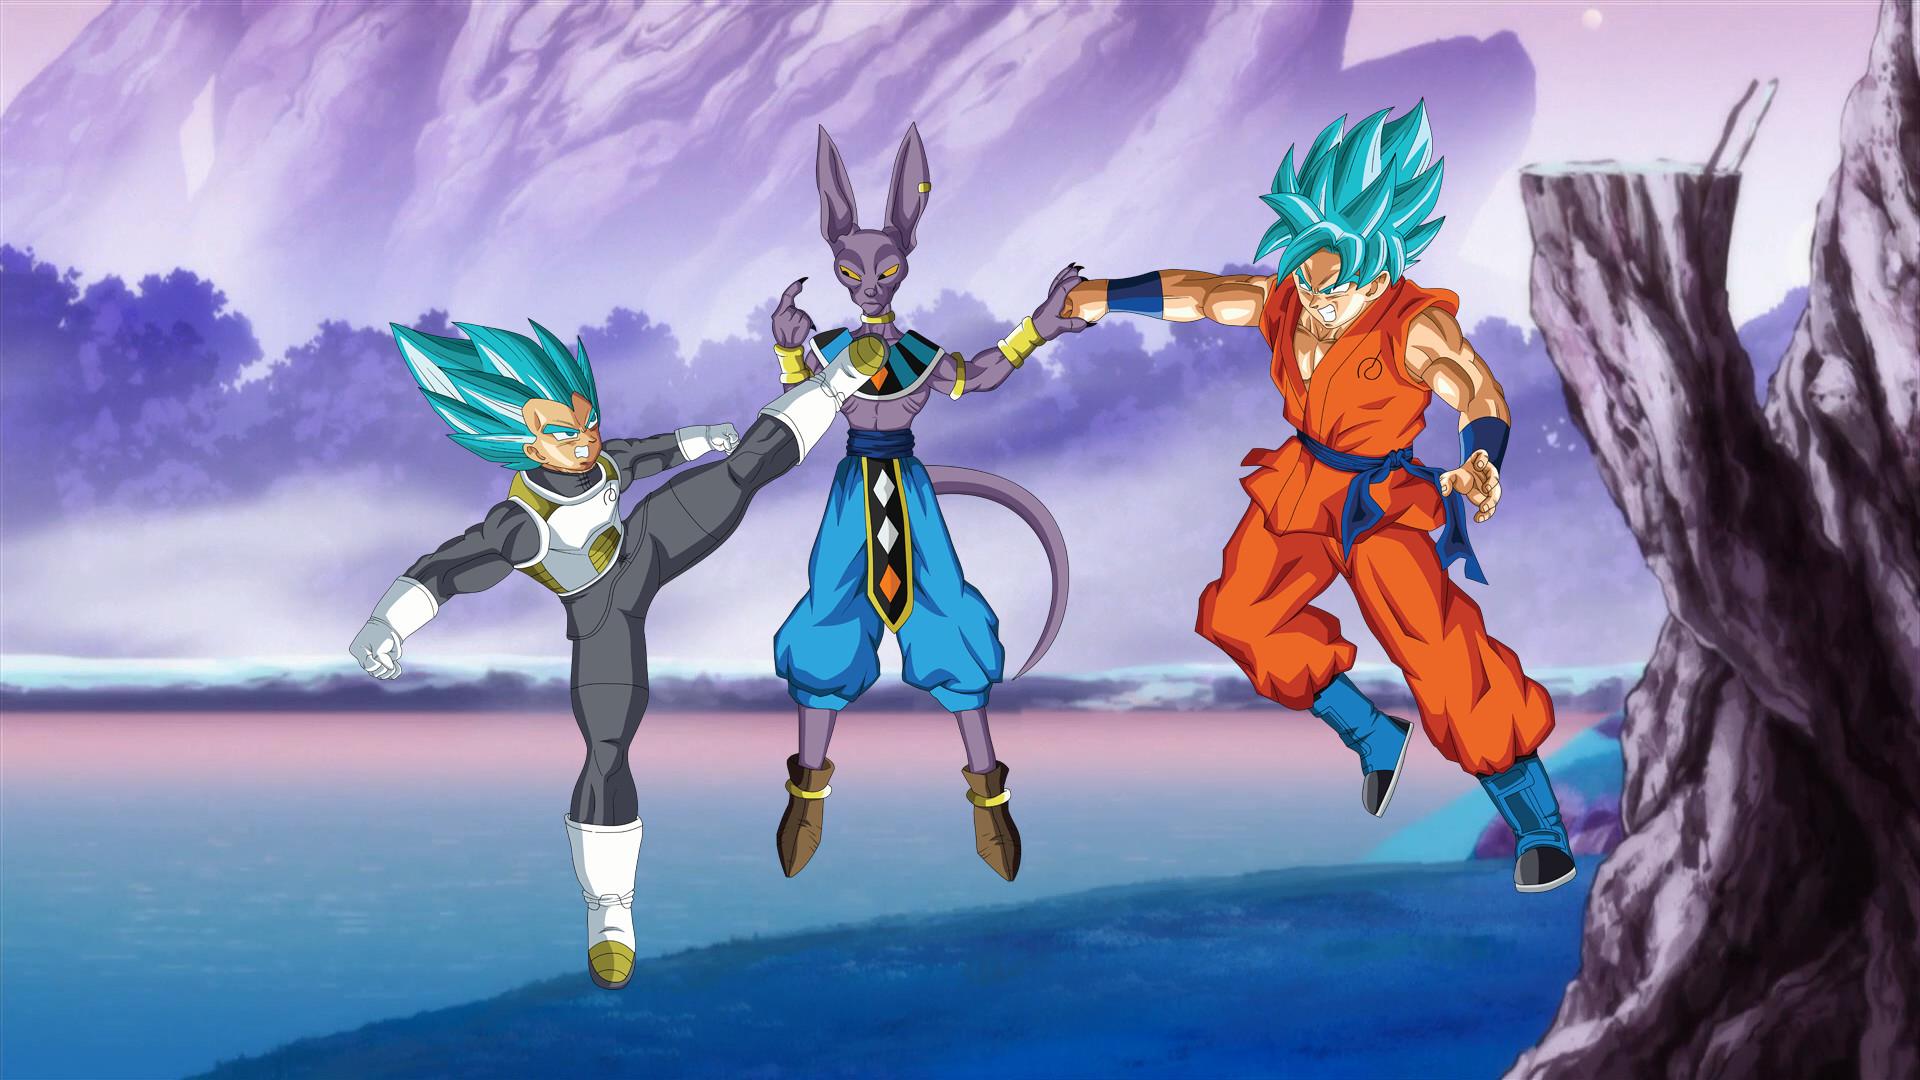 Vegeta and Goku SSGSS vs Lord Beerus Wallpaper by EymSmiley on .